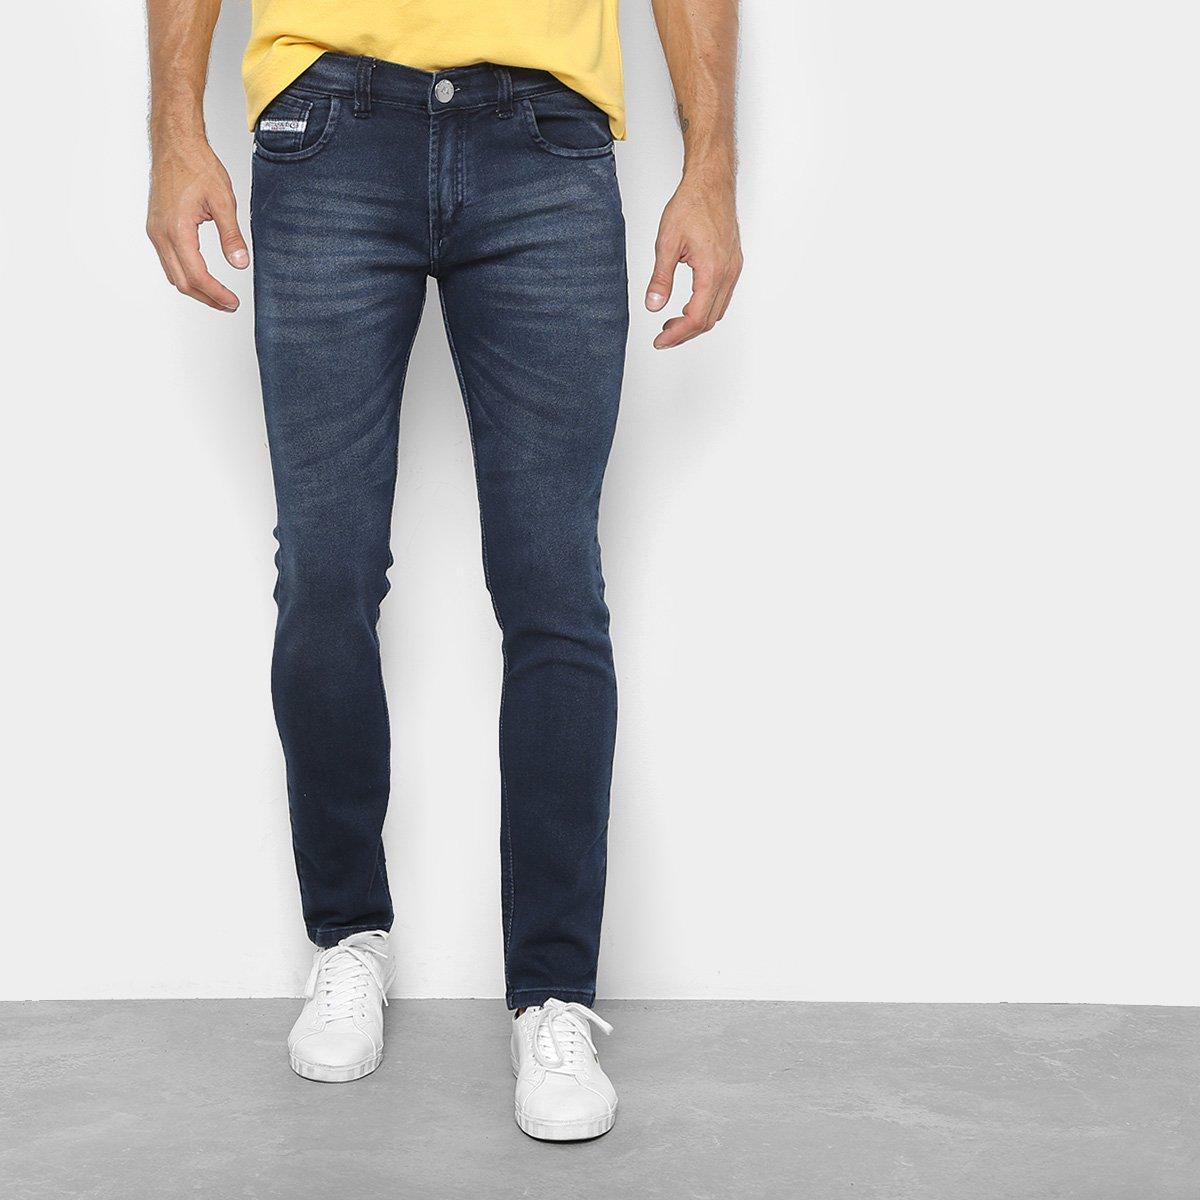 34da9e7dc Calça Jeans Preston Confort Jeans Moletinho Masculina